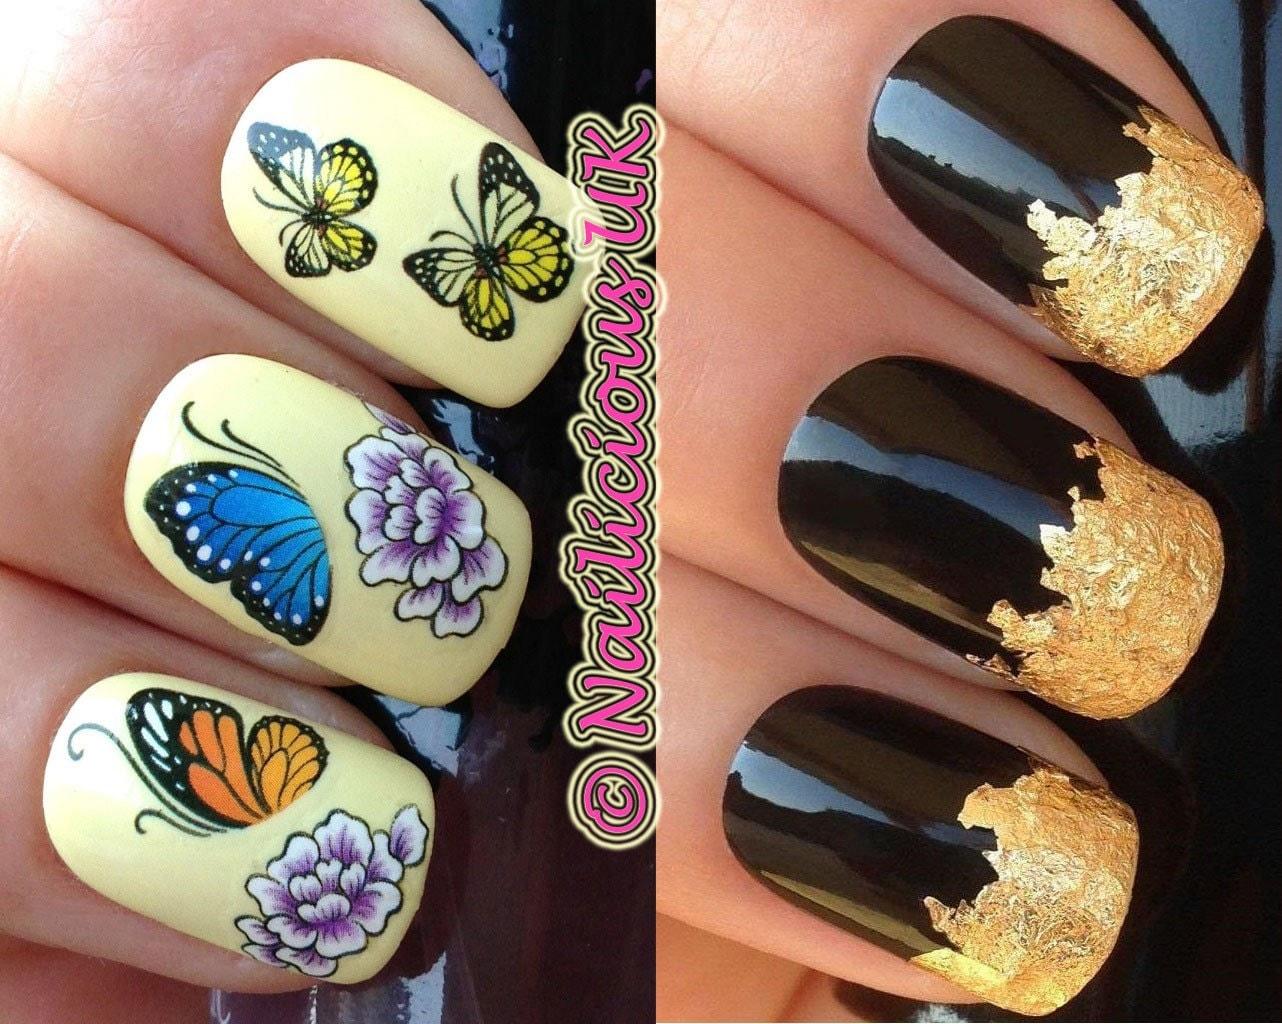 nail art set 229. pretty flowers and butterflies water